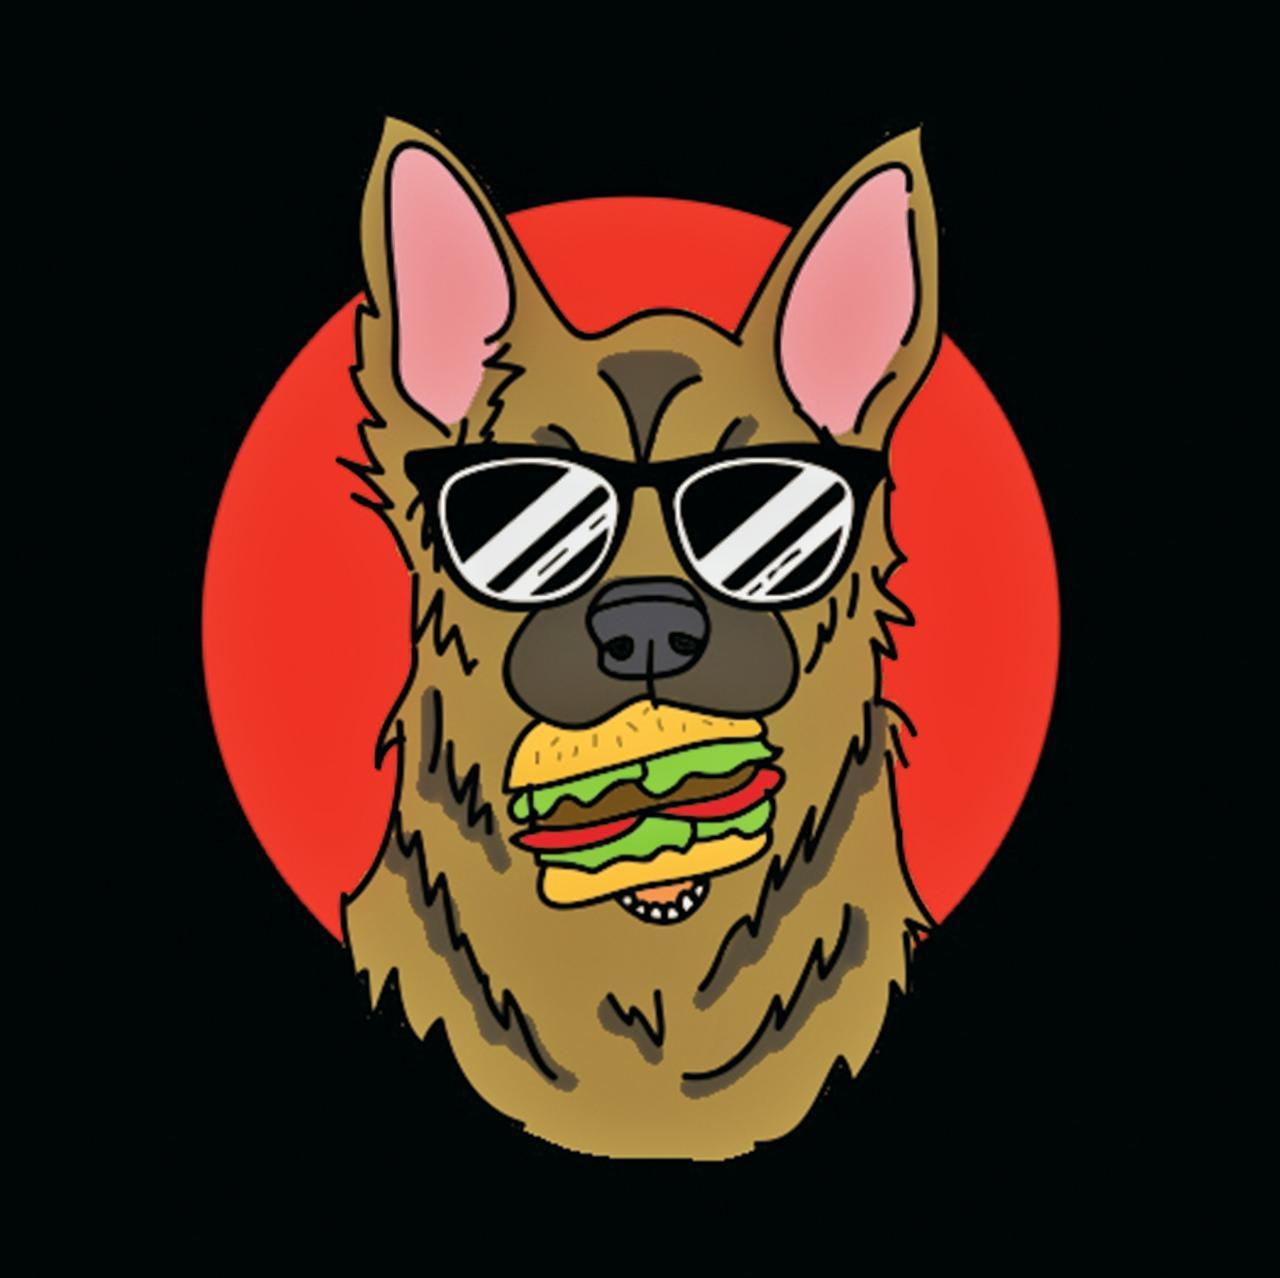 Photo of user: Aindogs_Burgers